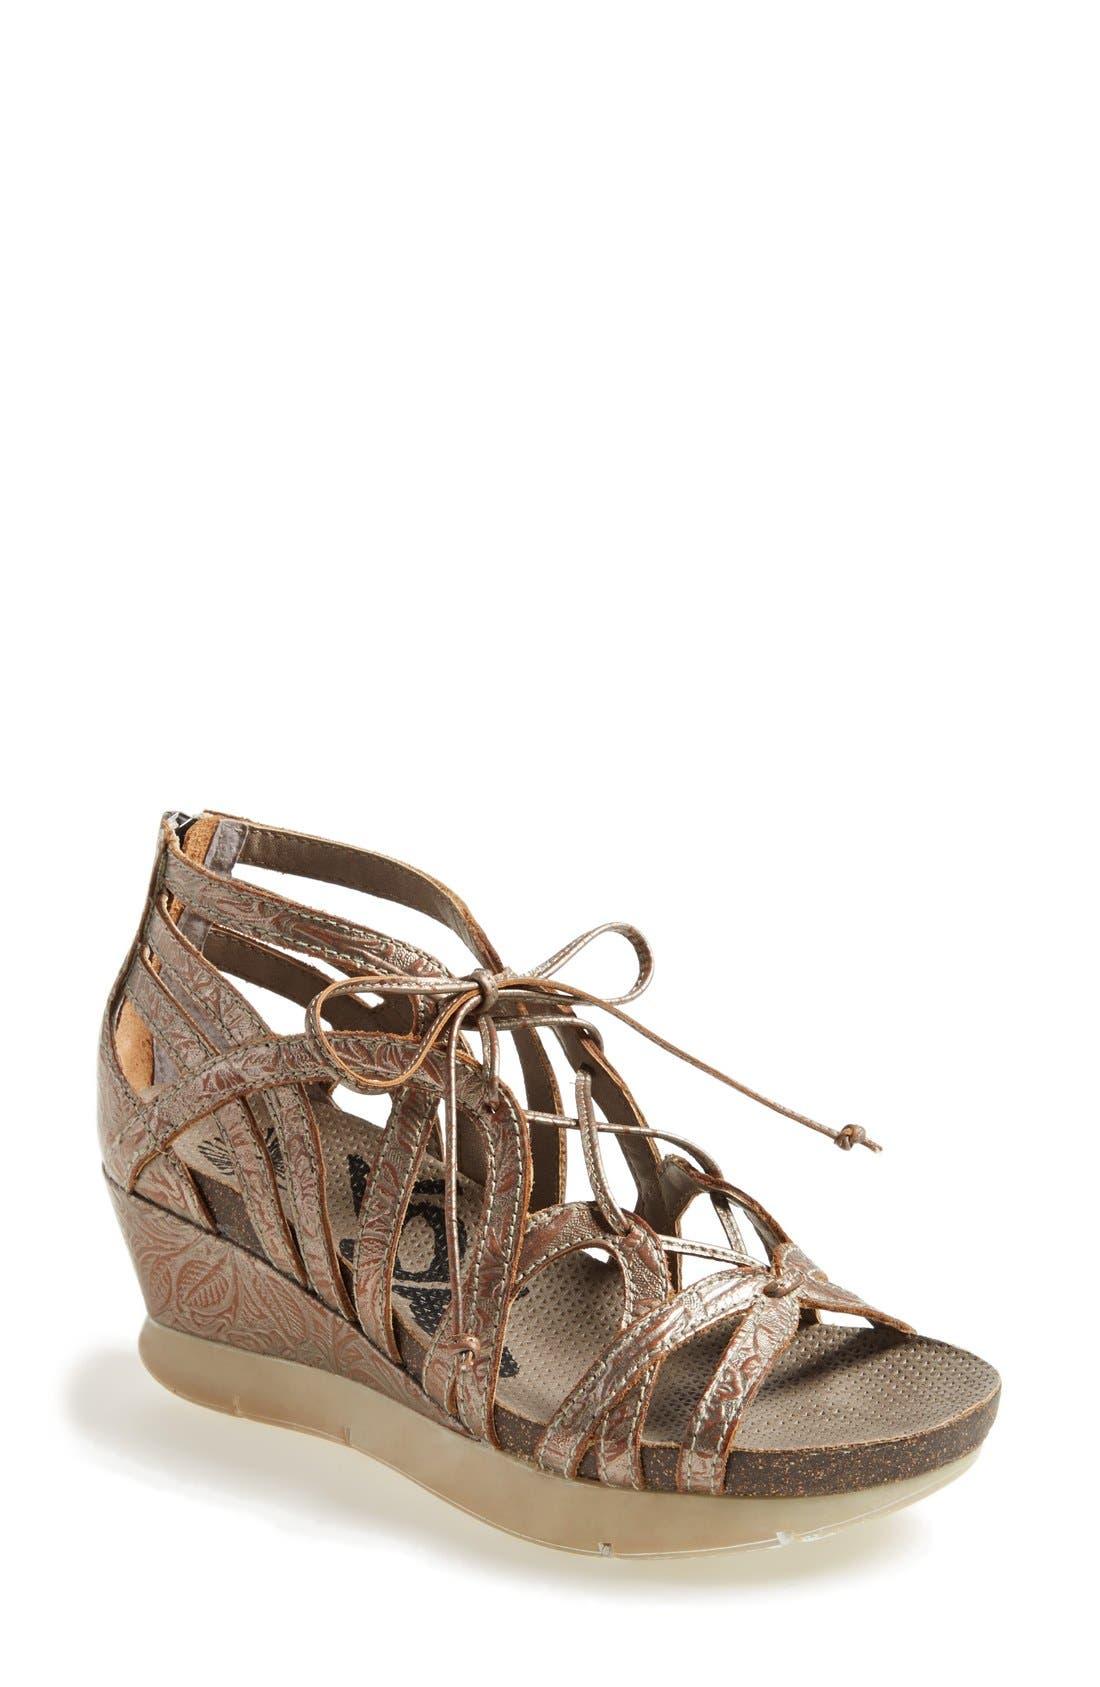 Alternate Image 1 Selected - OTBT 'Nomadic' Sandal (Women)